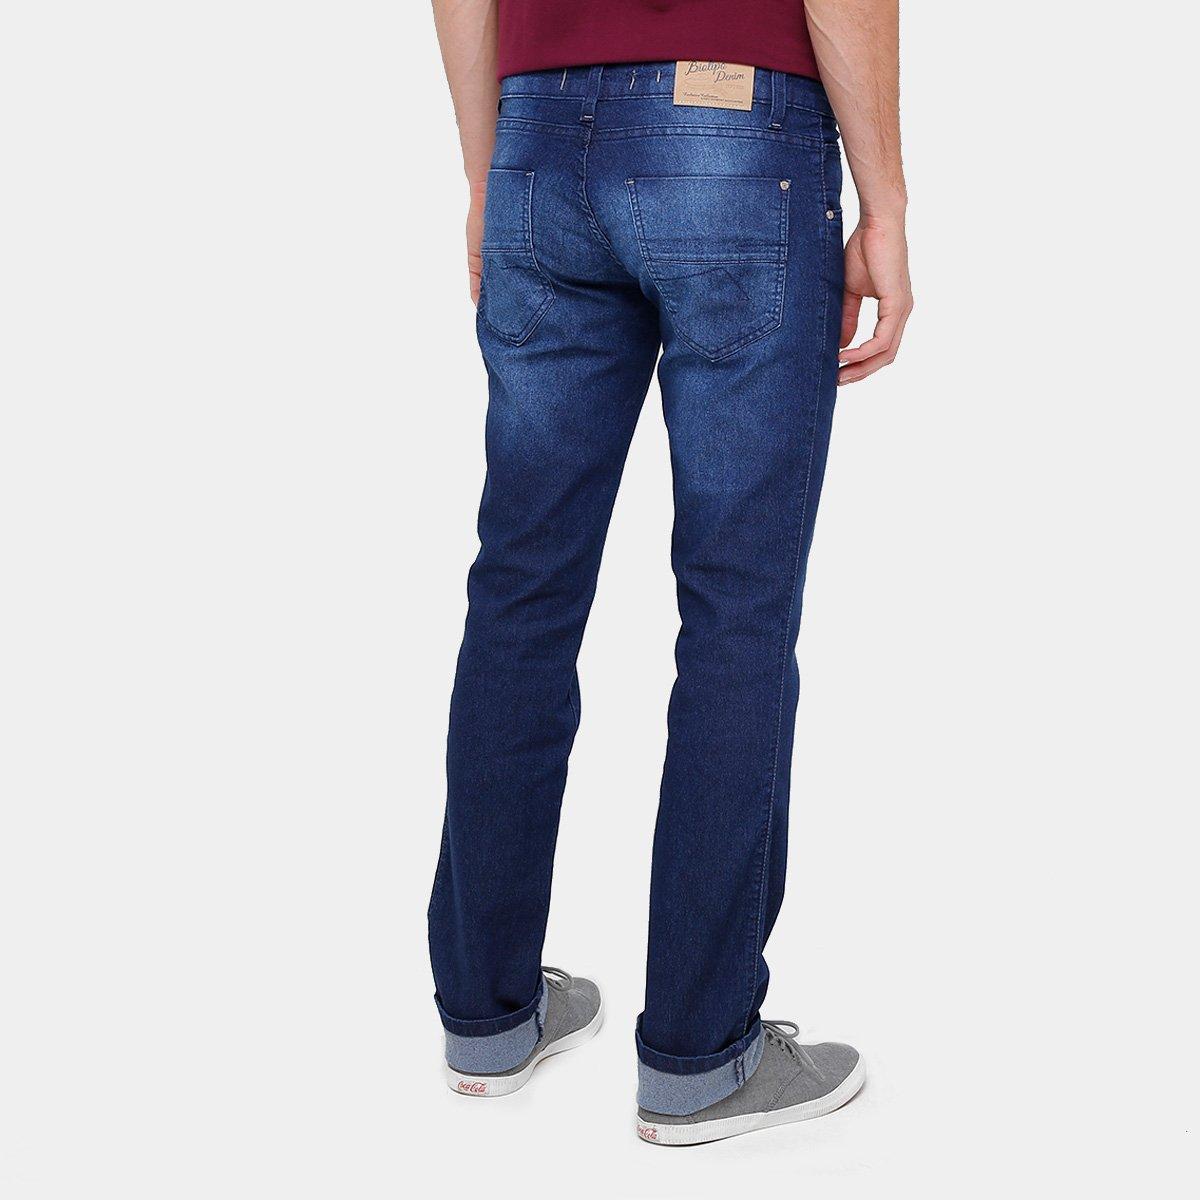 Calça Jeans Slim Fit Biotipo Estonada Masculina - Compre Agora ... 5f65b91212c